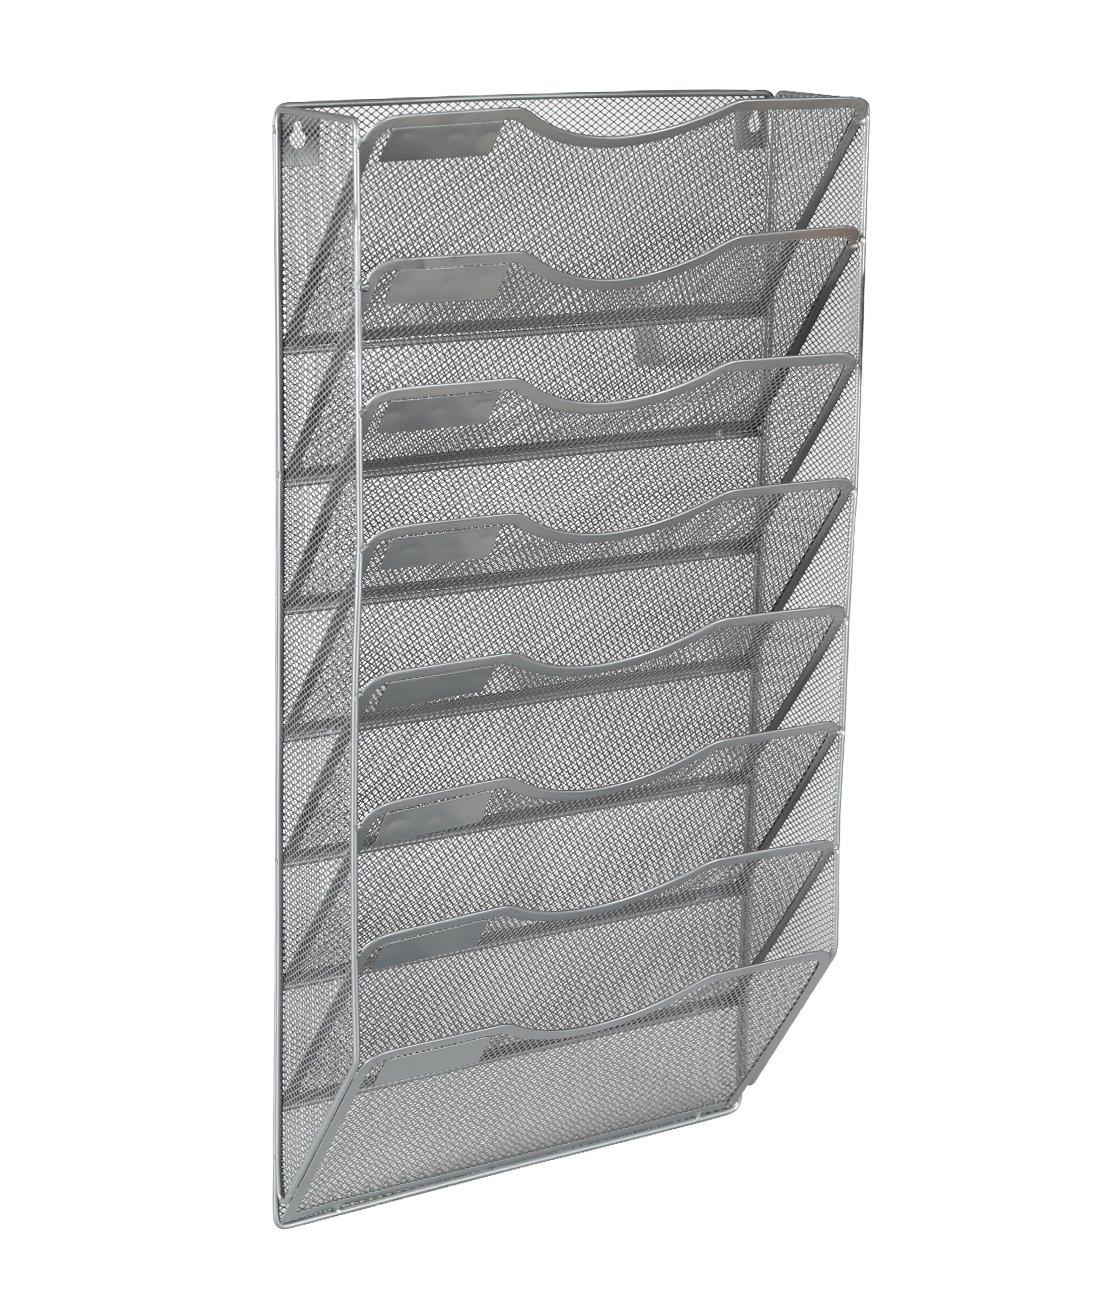 EasyPAG Office 8 Pocket Wall File Holder Organizer Hanging Magazine Rack,Silver